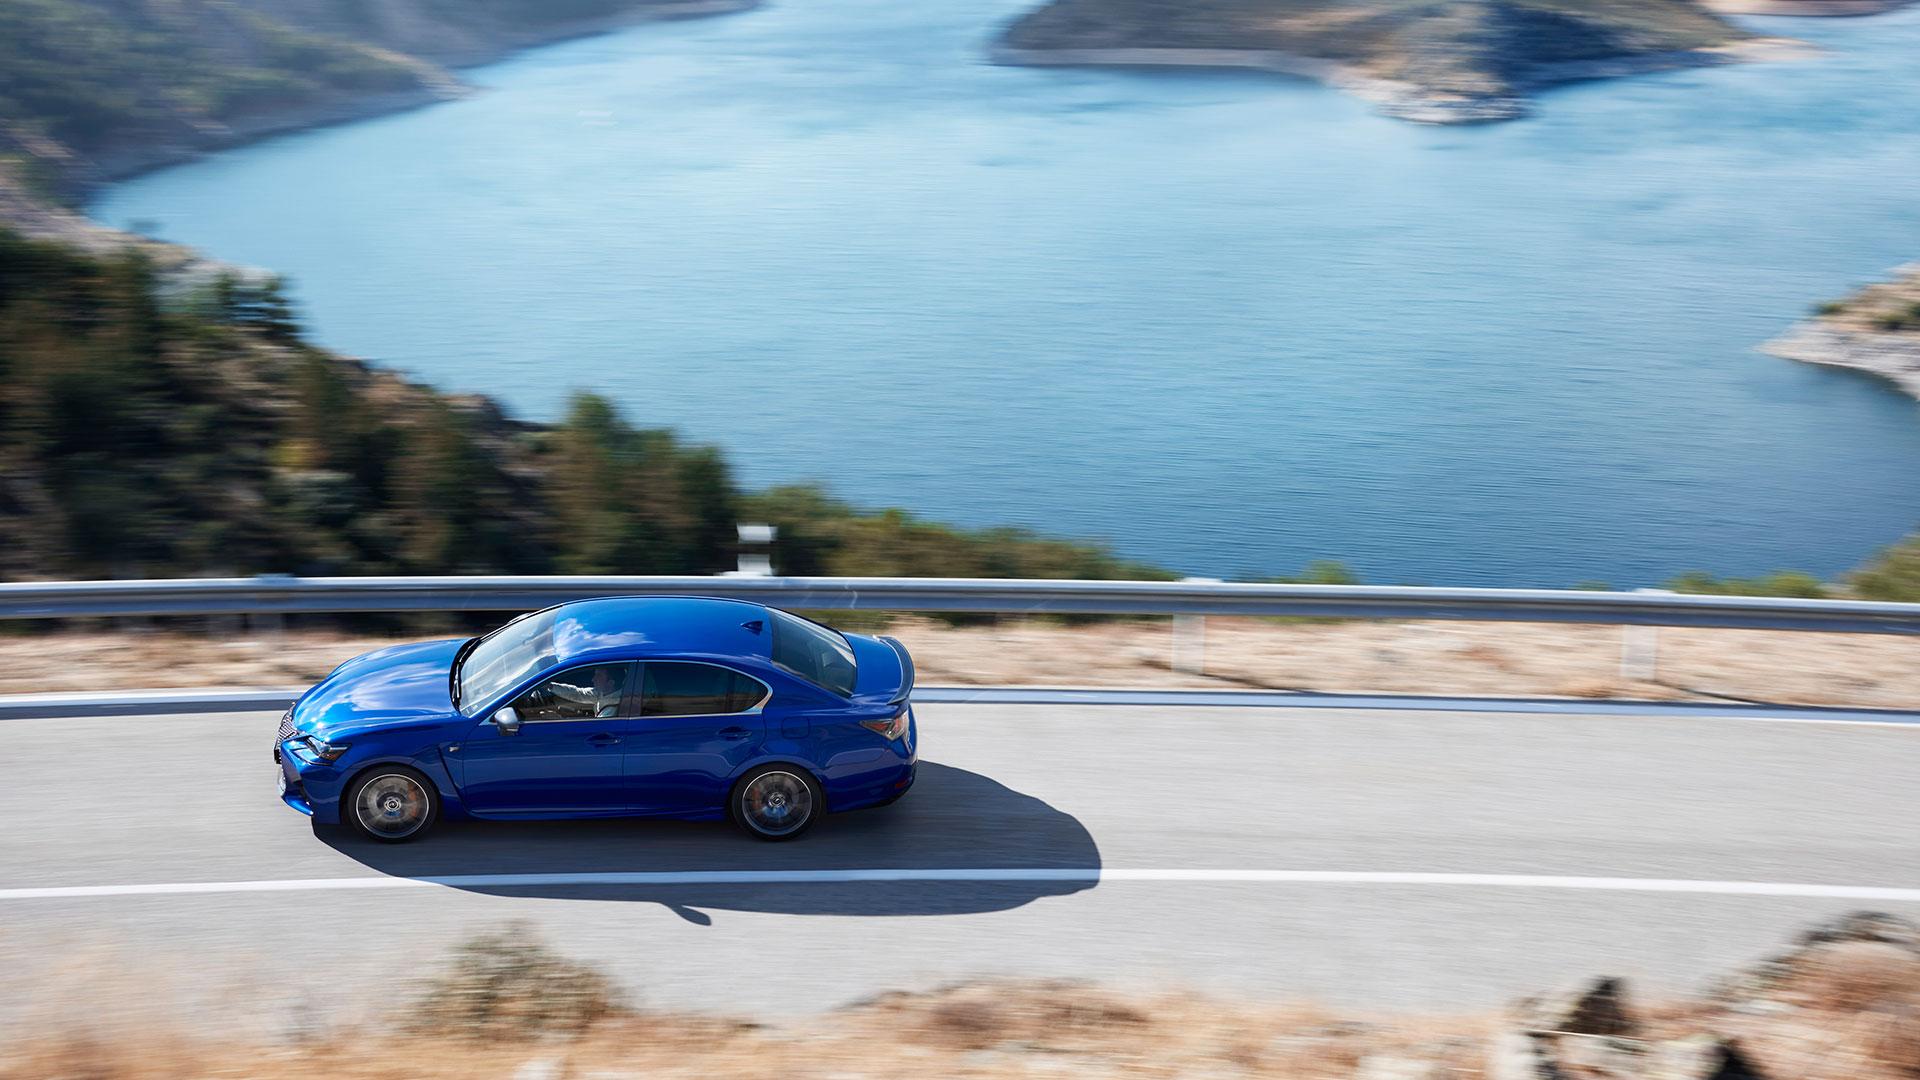 Lexus desvela Lexus GS F hero asset